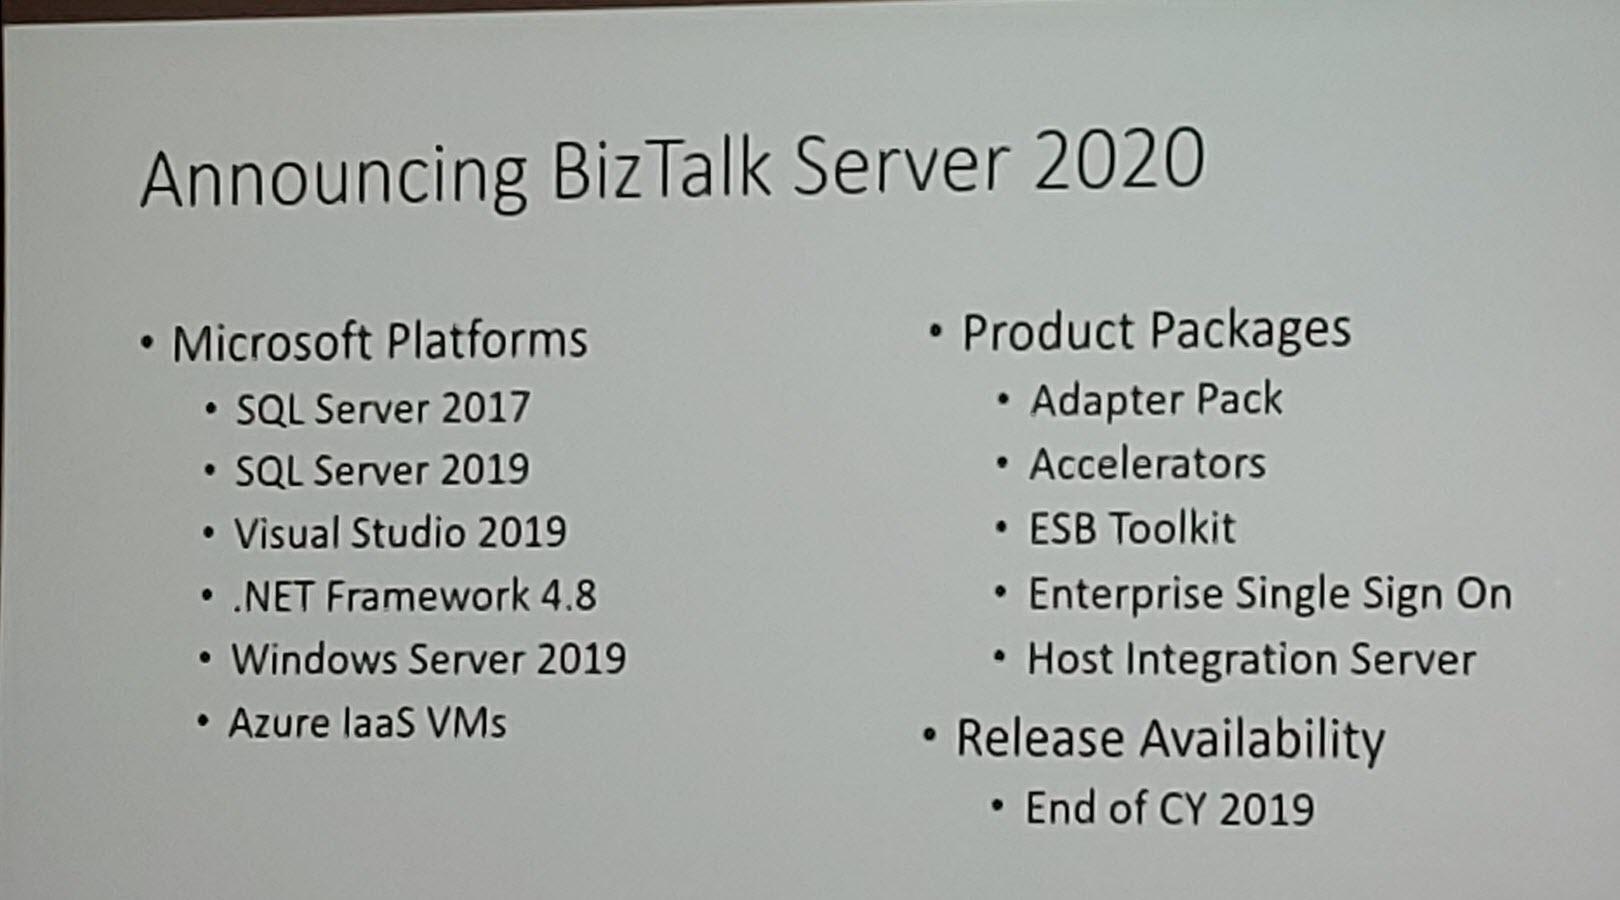 BizTalk-Server-2020-announced-at-INTEGRATE2019